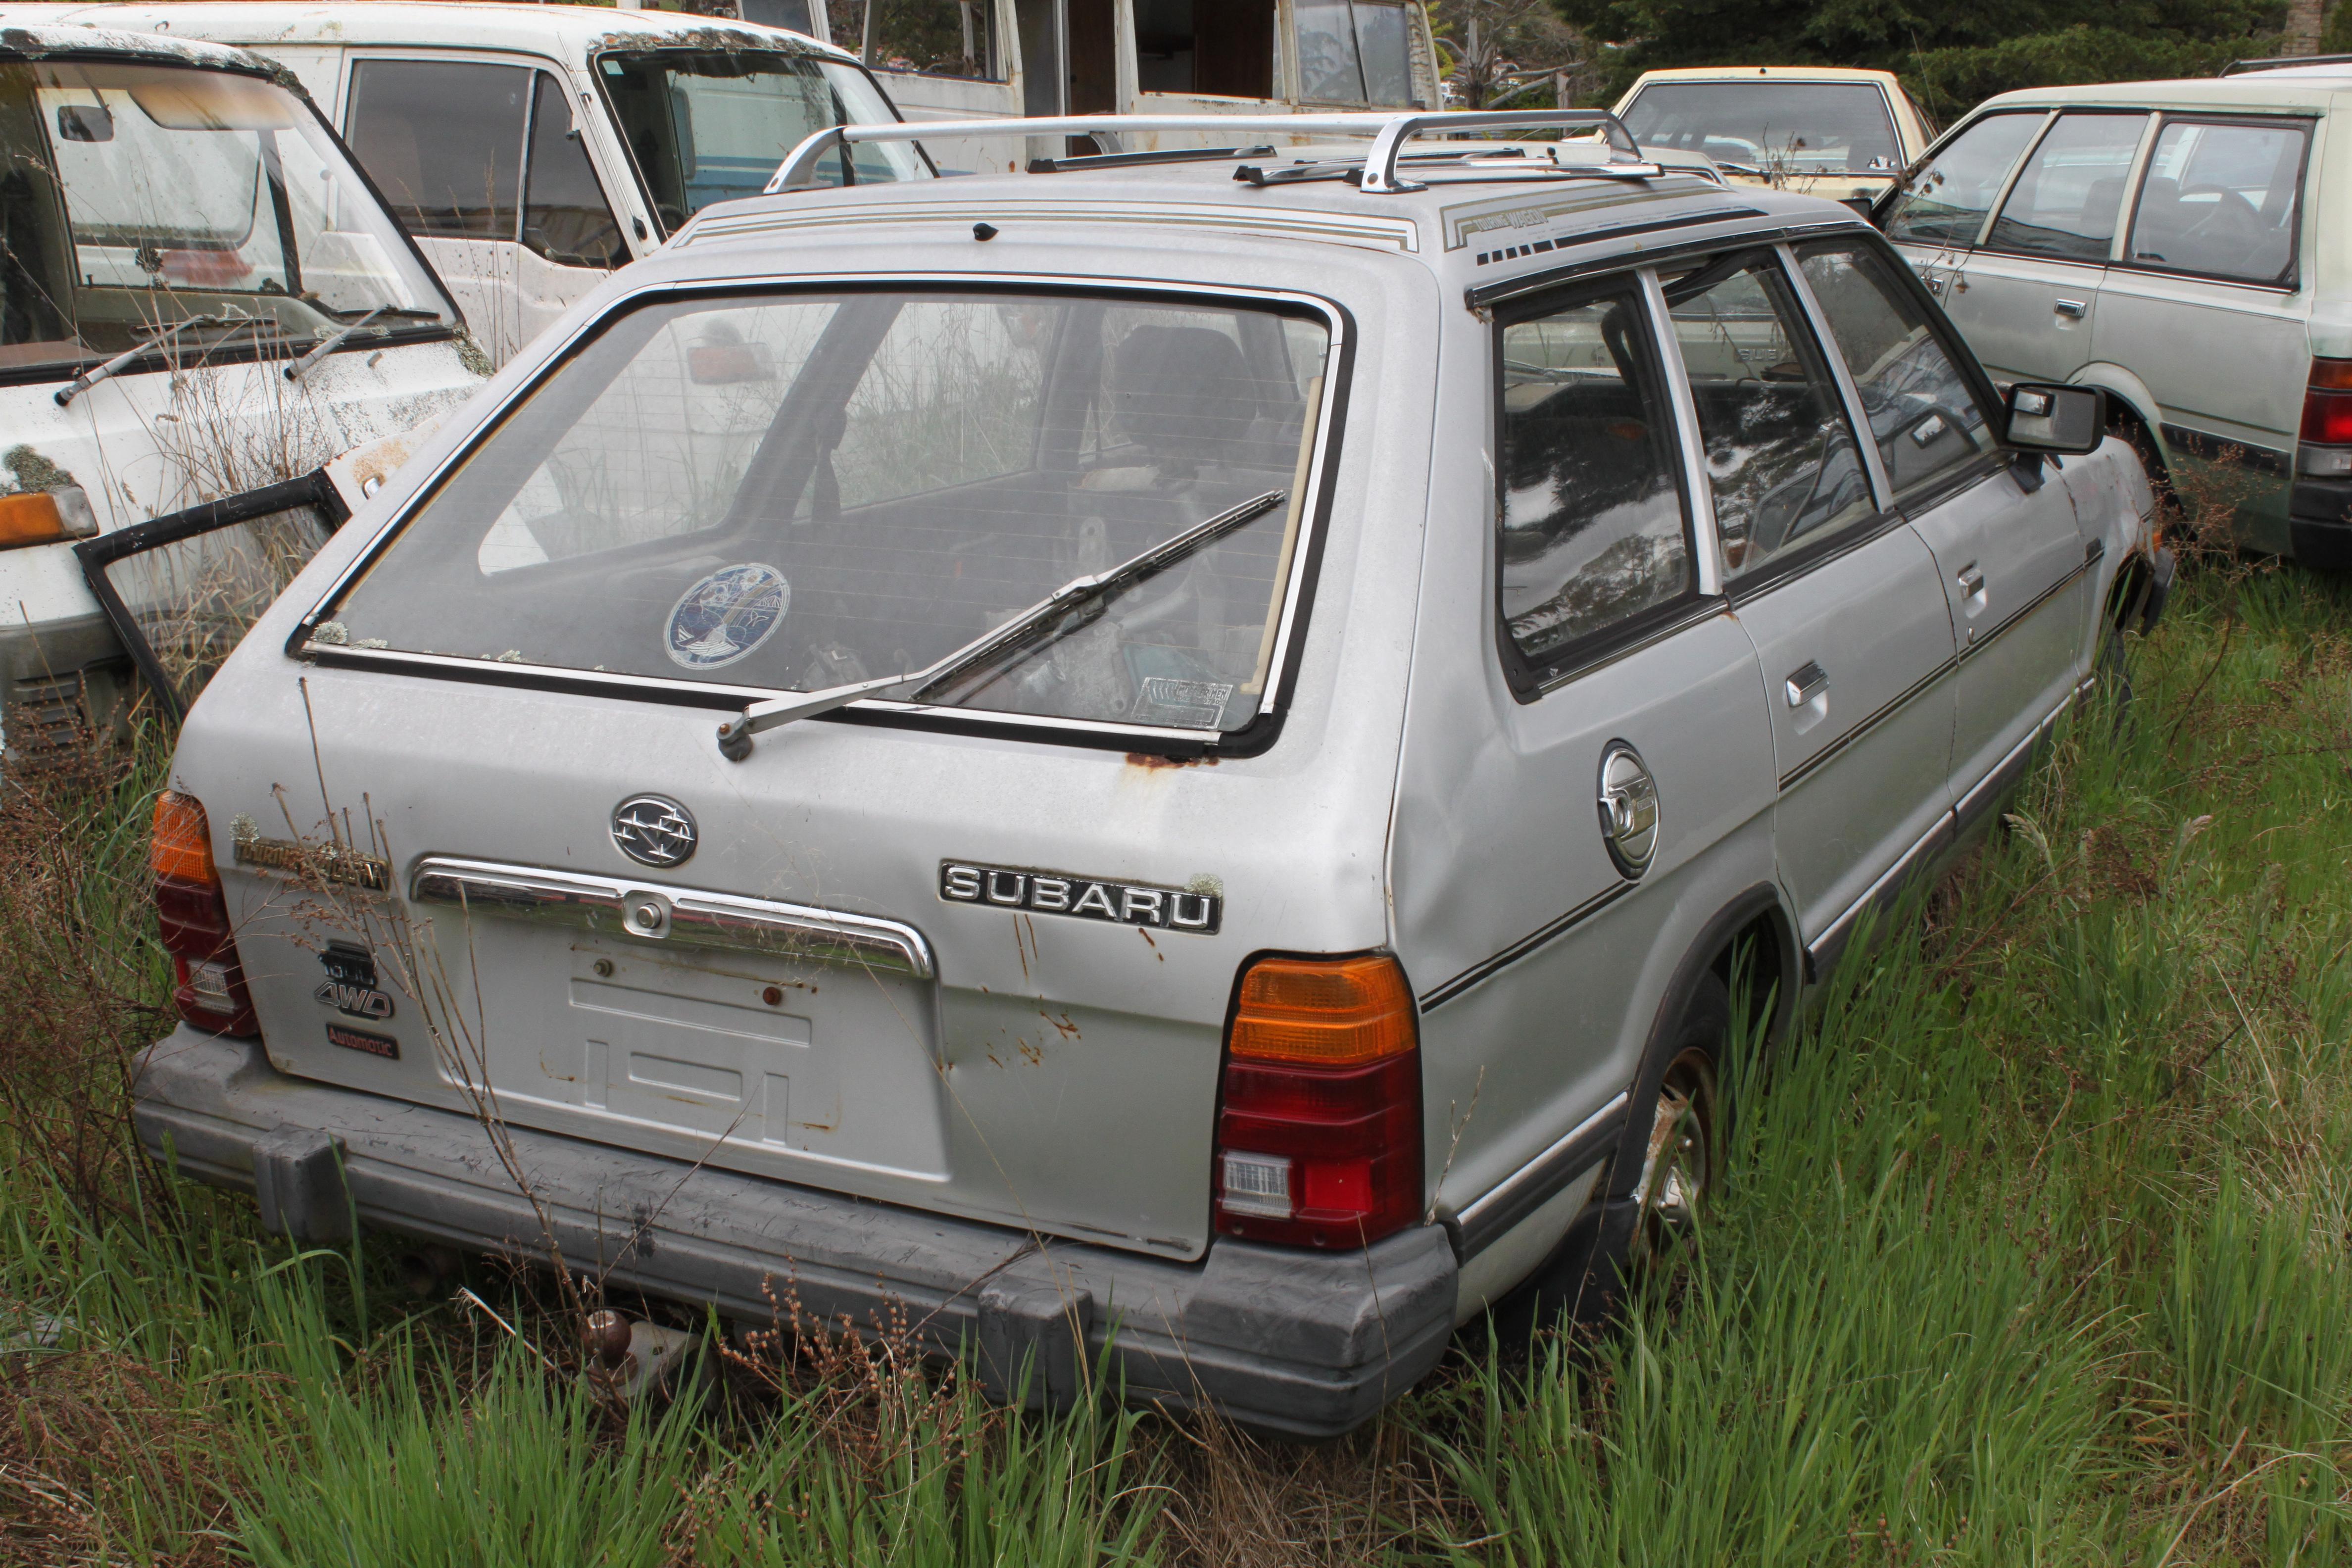 Subaru 4wd wagon